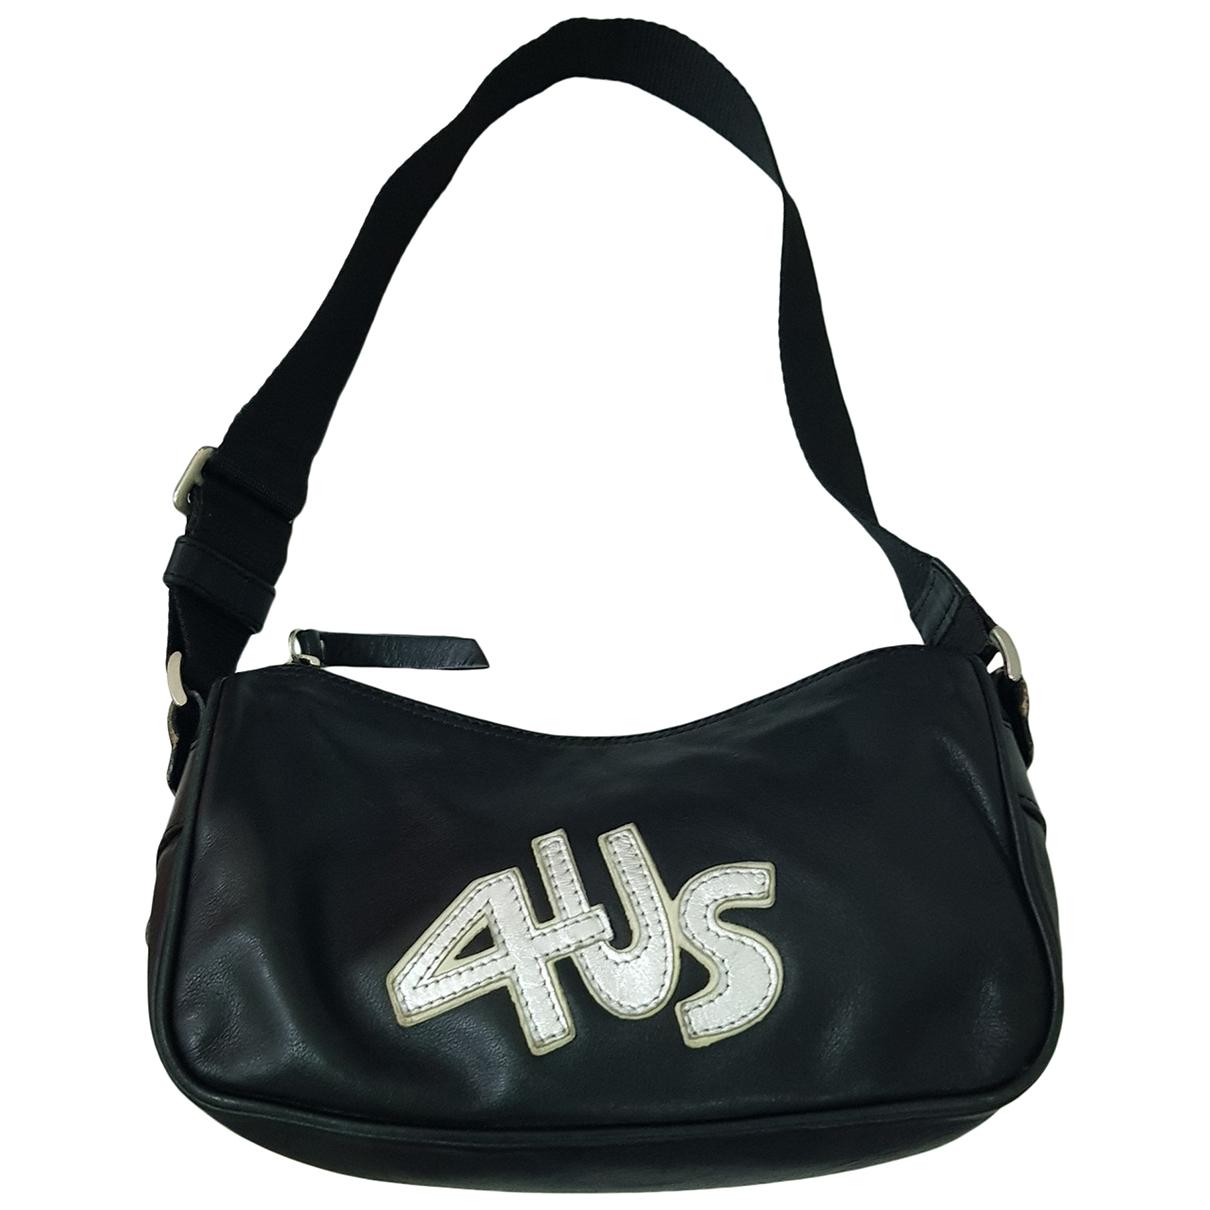 Cesare Paciotti \N Black Leather handbag for Women \N